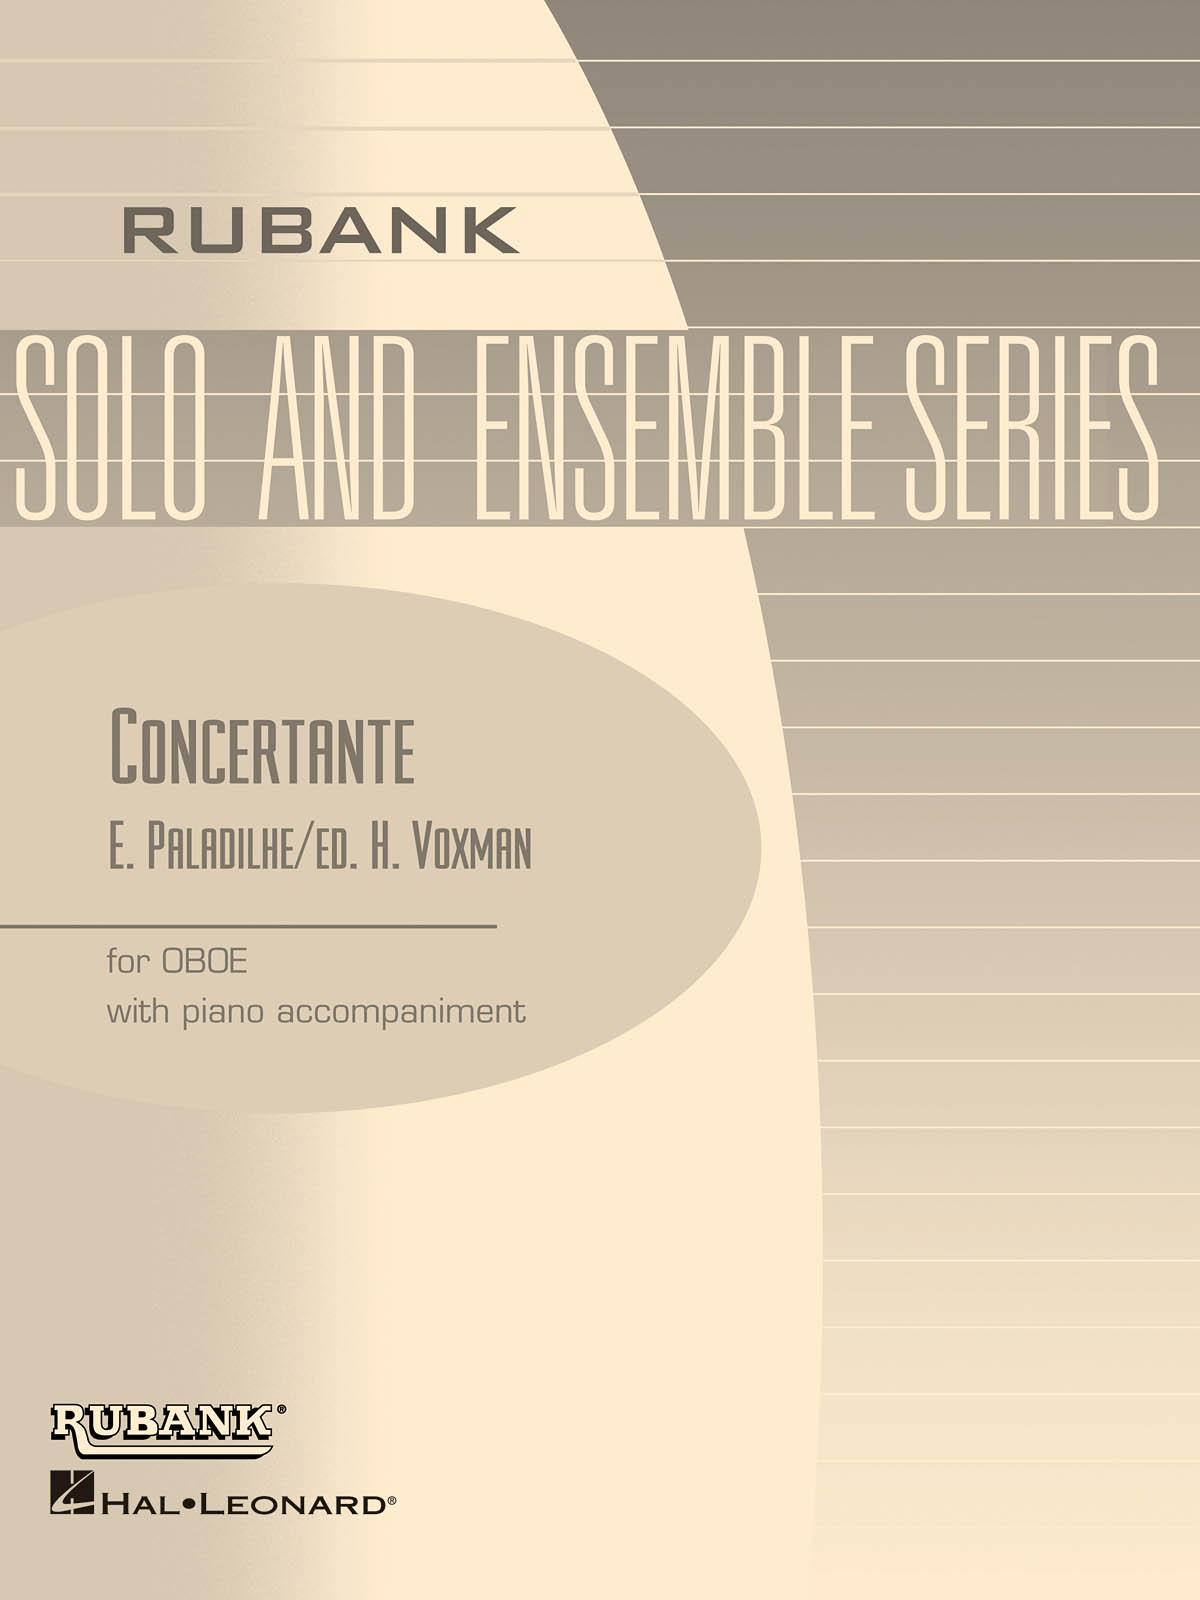 Emile Paladilhe: Concertante: Oboe and Accomp.: Instrumental Album